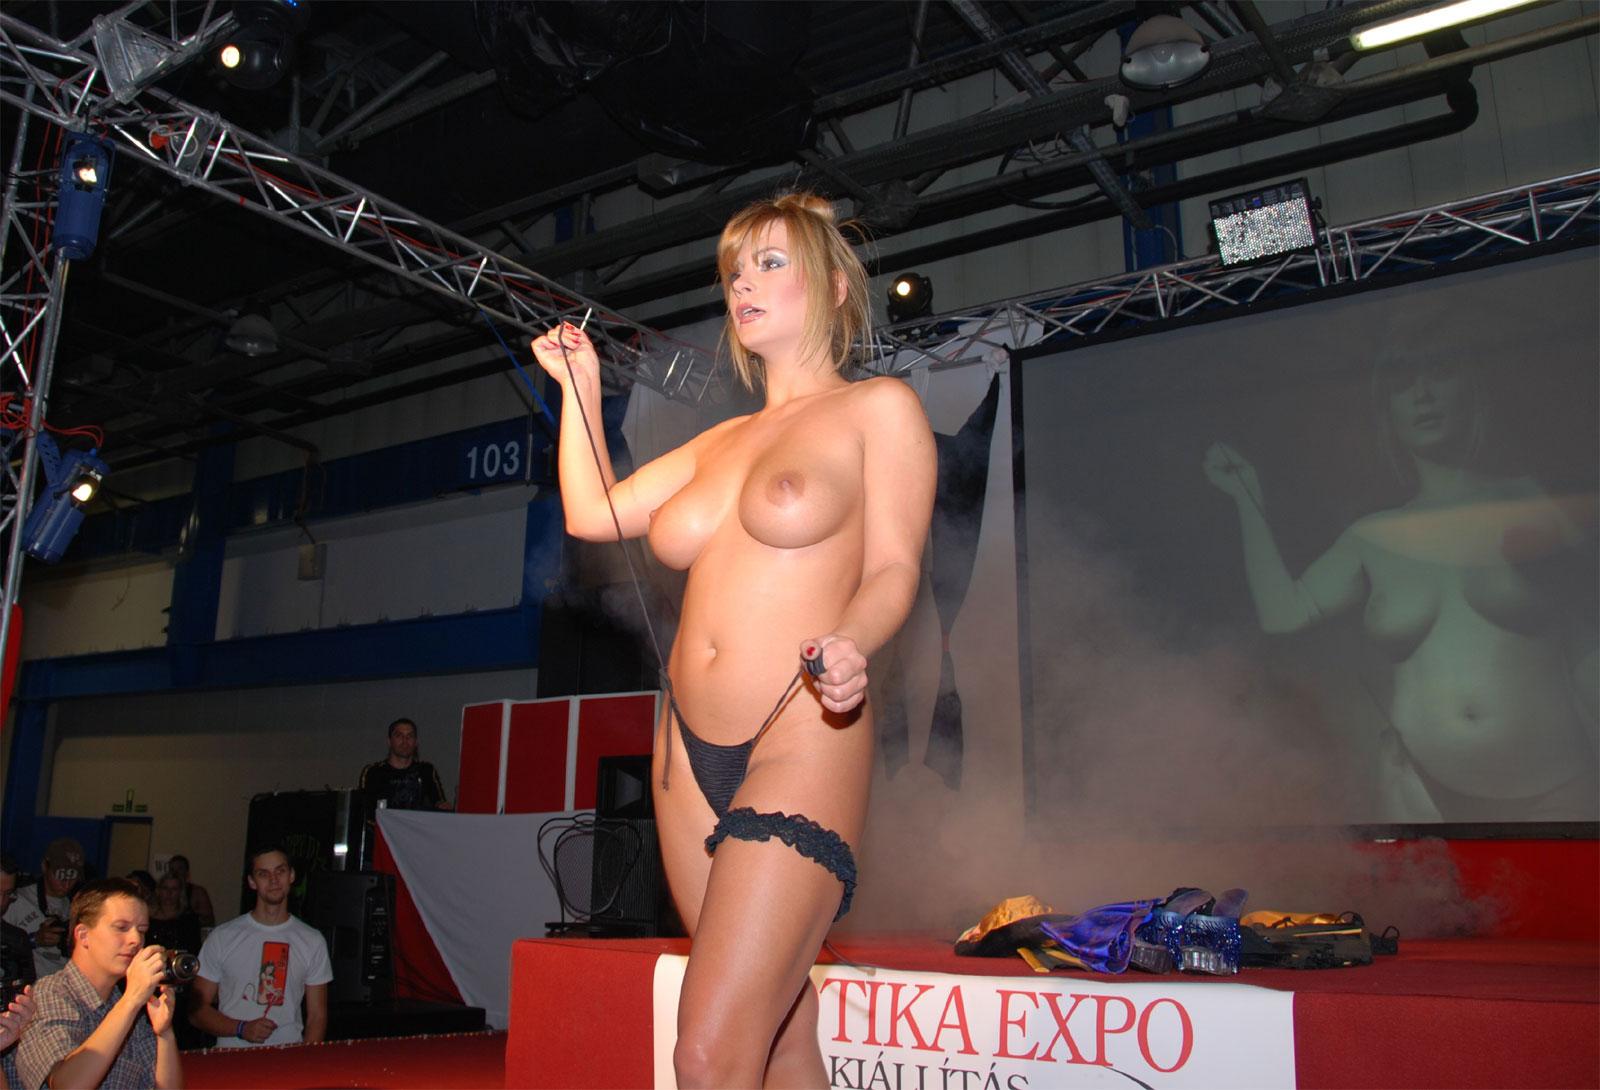 Big tits exotic erotic expo sex tiny beach video